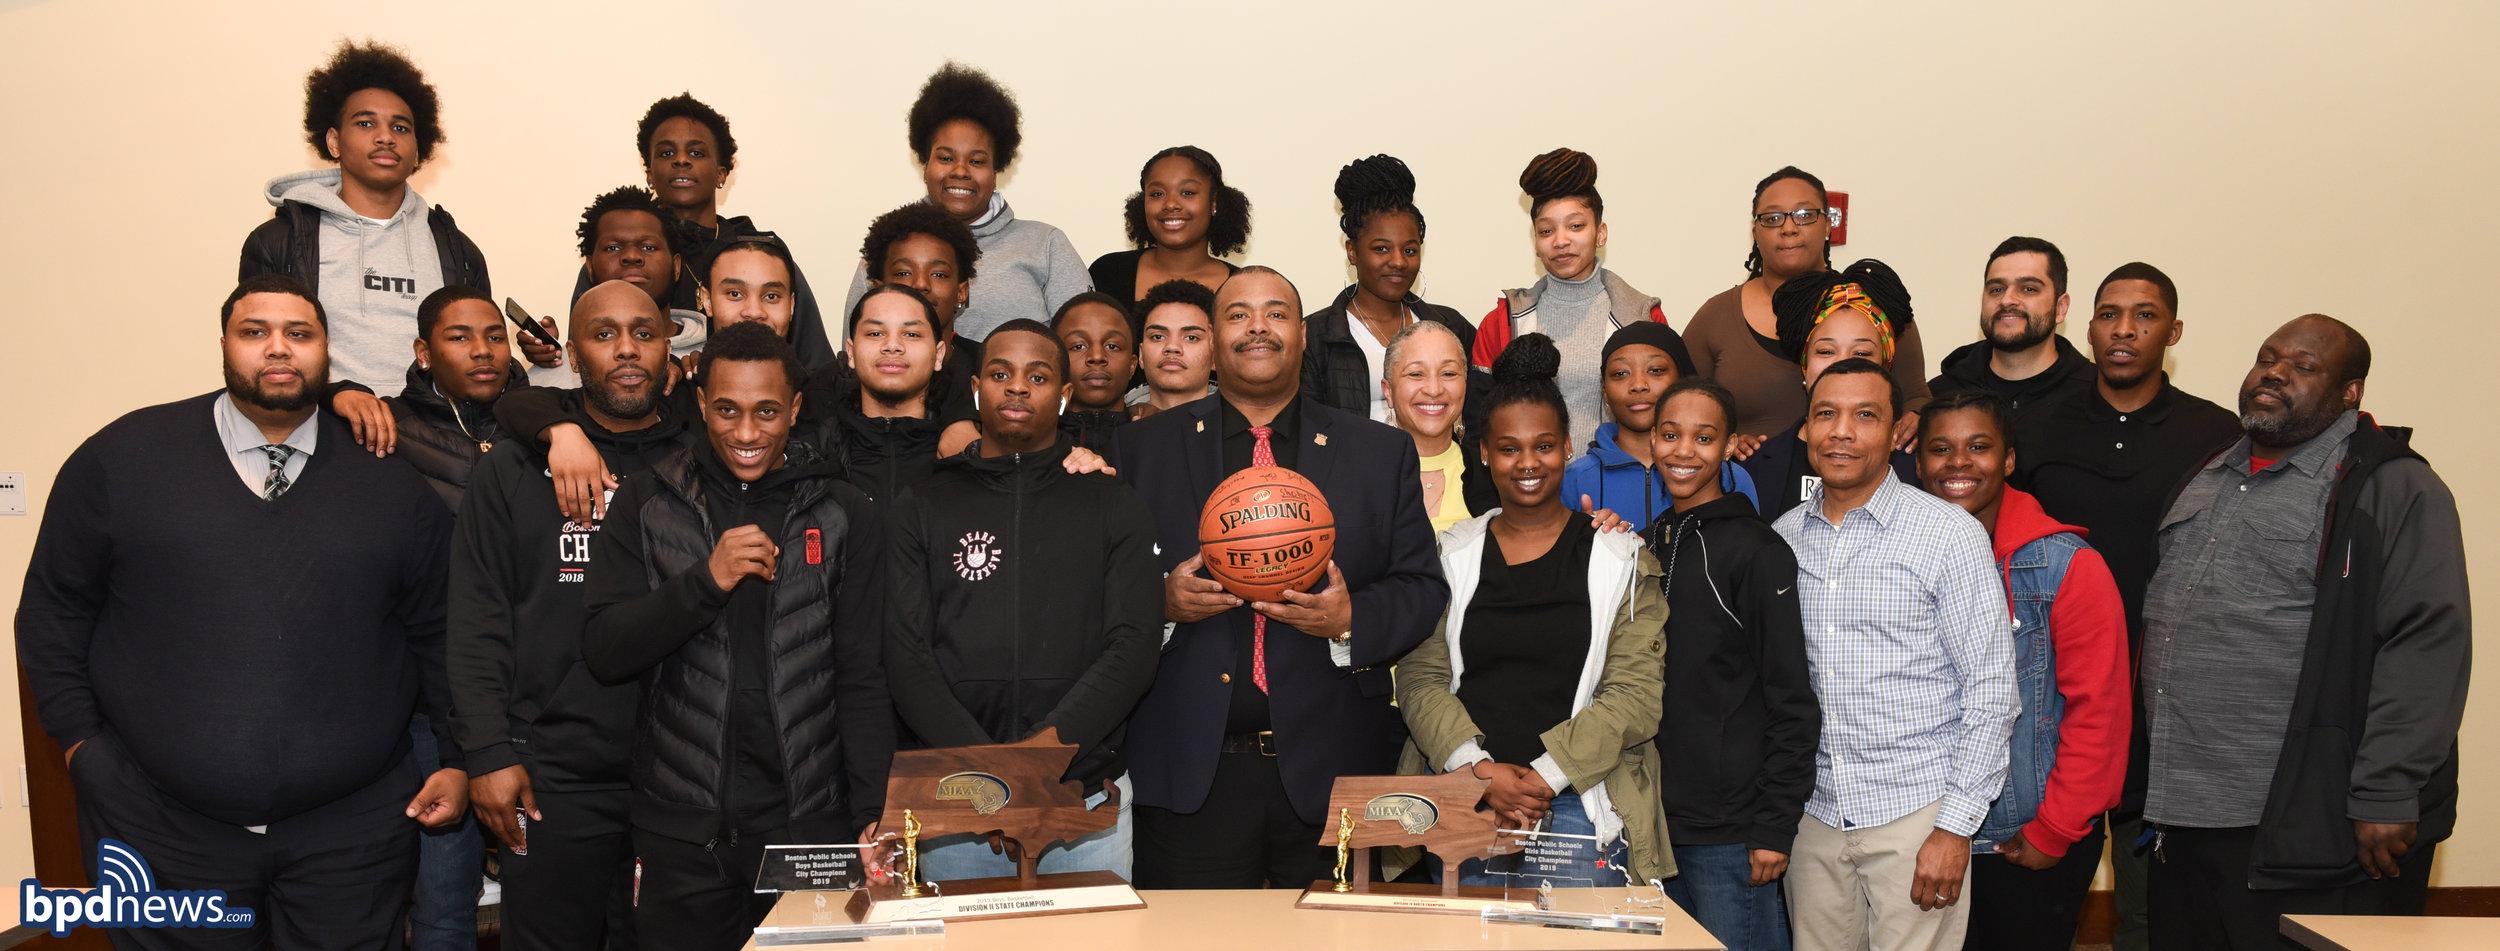 20190425 Basketball championship Team-16.jpg